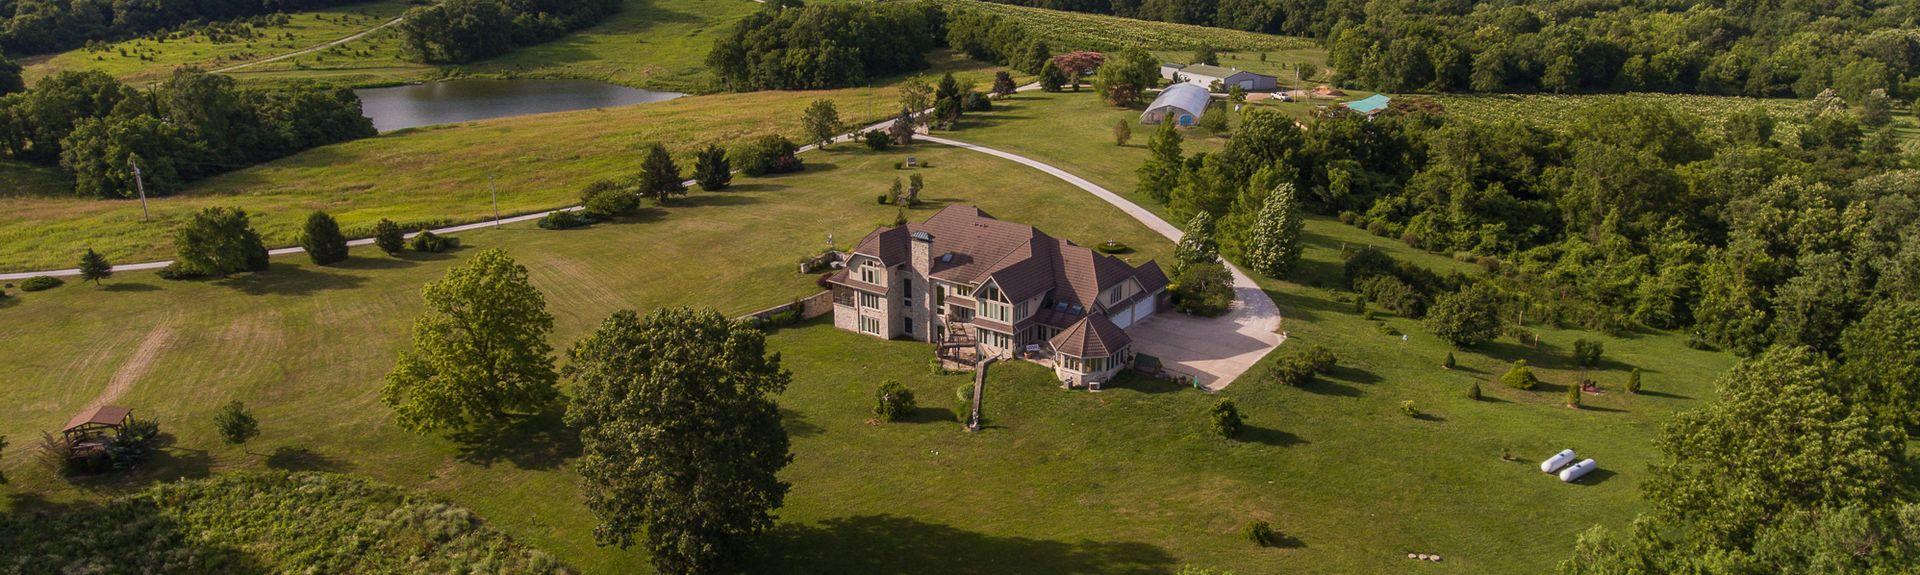 Endless Summer Winery, Hermann, Missouri, United States of America